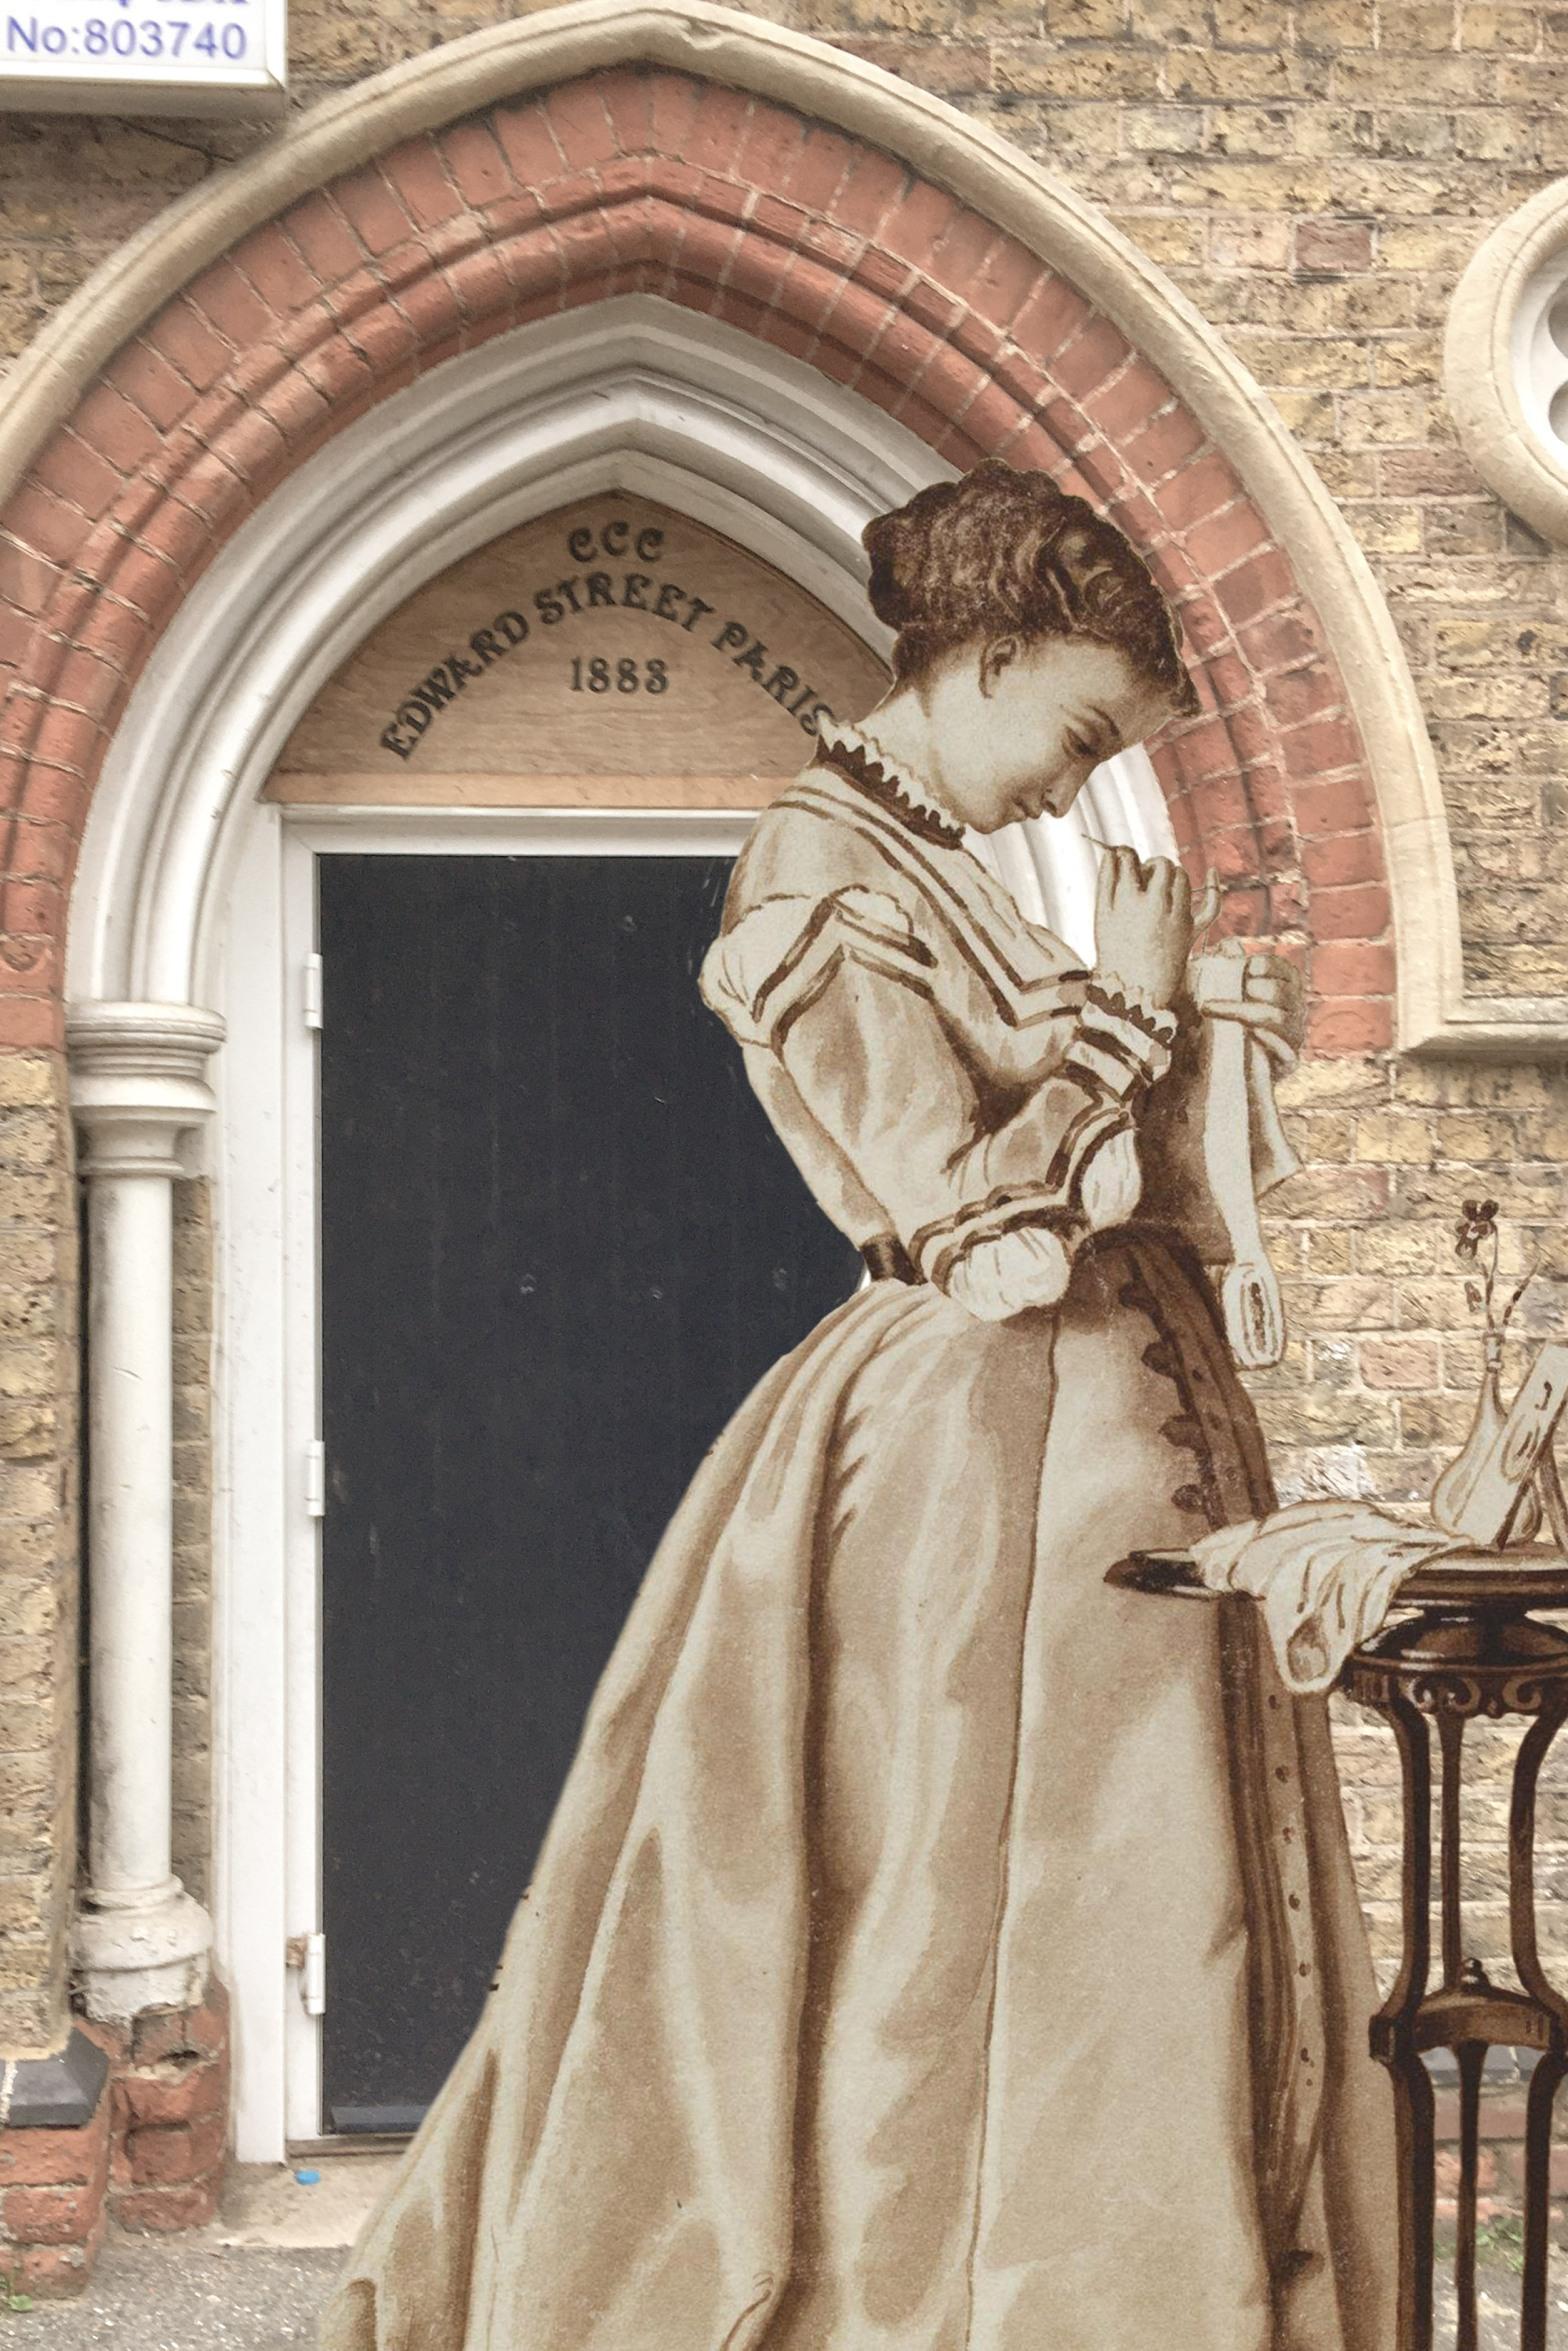 "Charles François Marchal's ""Penelope"" (1868) on Edtward Street, Deptford Penelope image sourced from the Victoria & Albert Museum (Item No. 0576977-2013fy9050)"